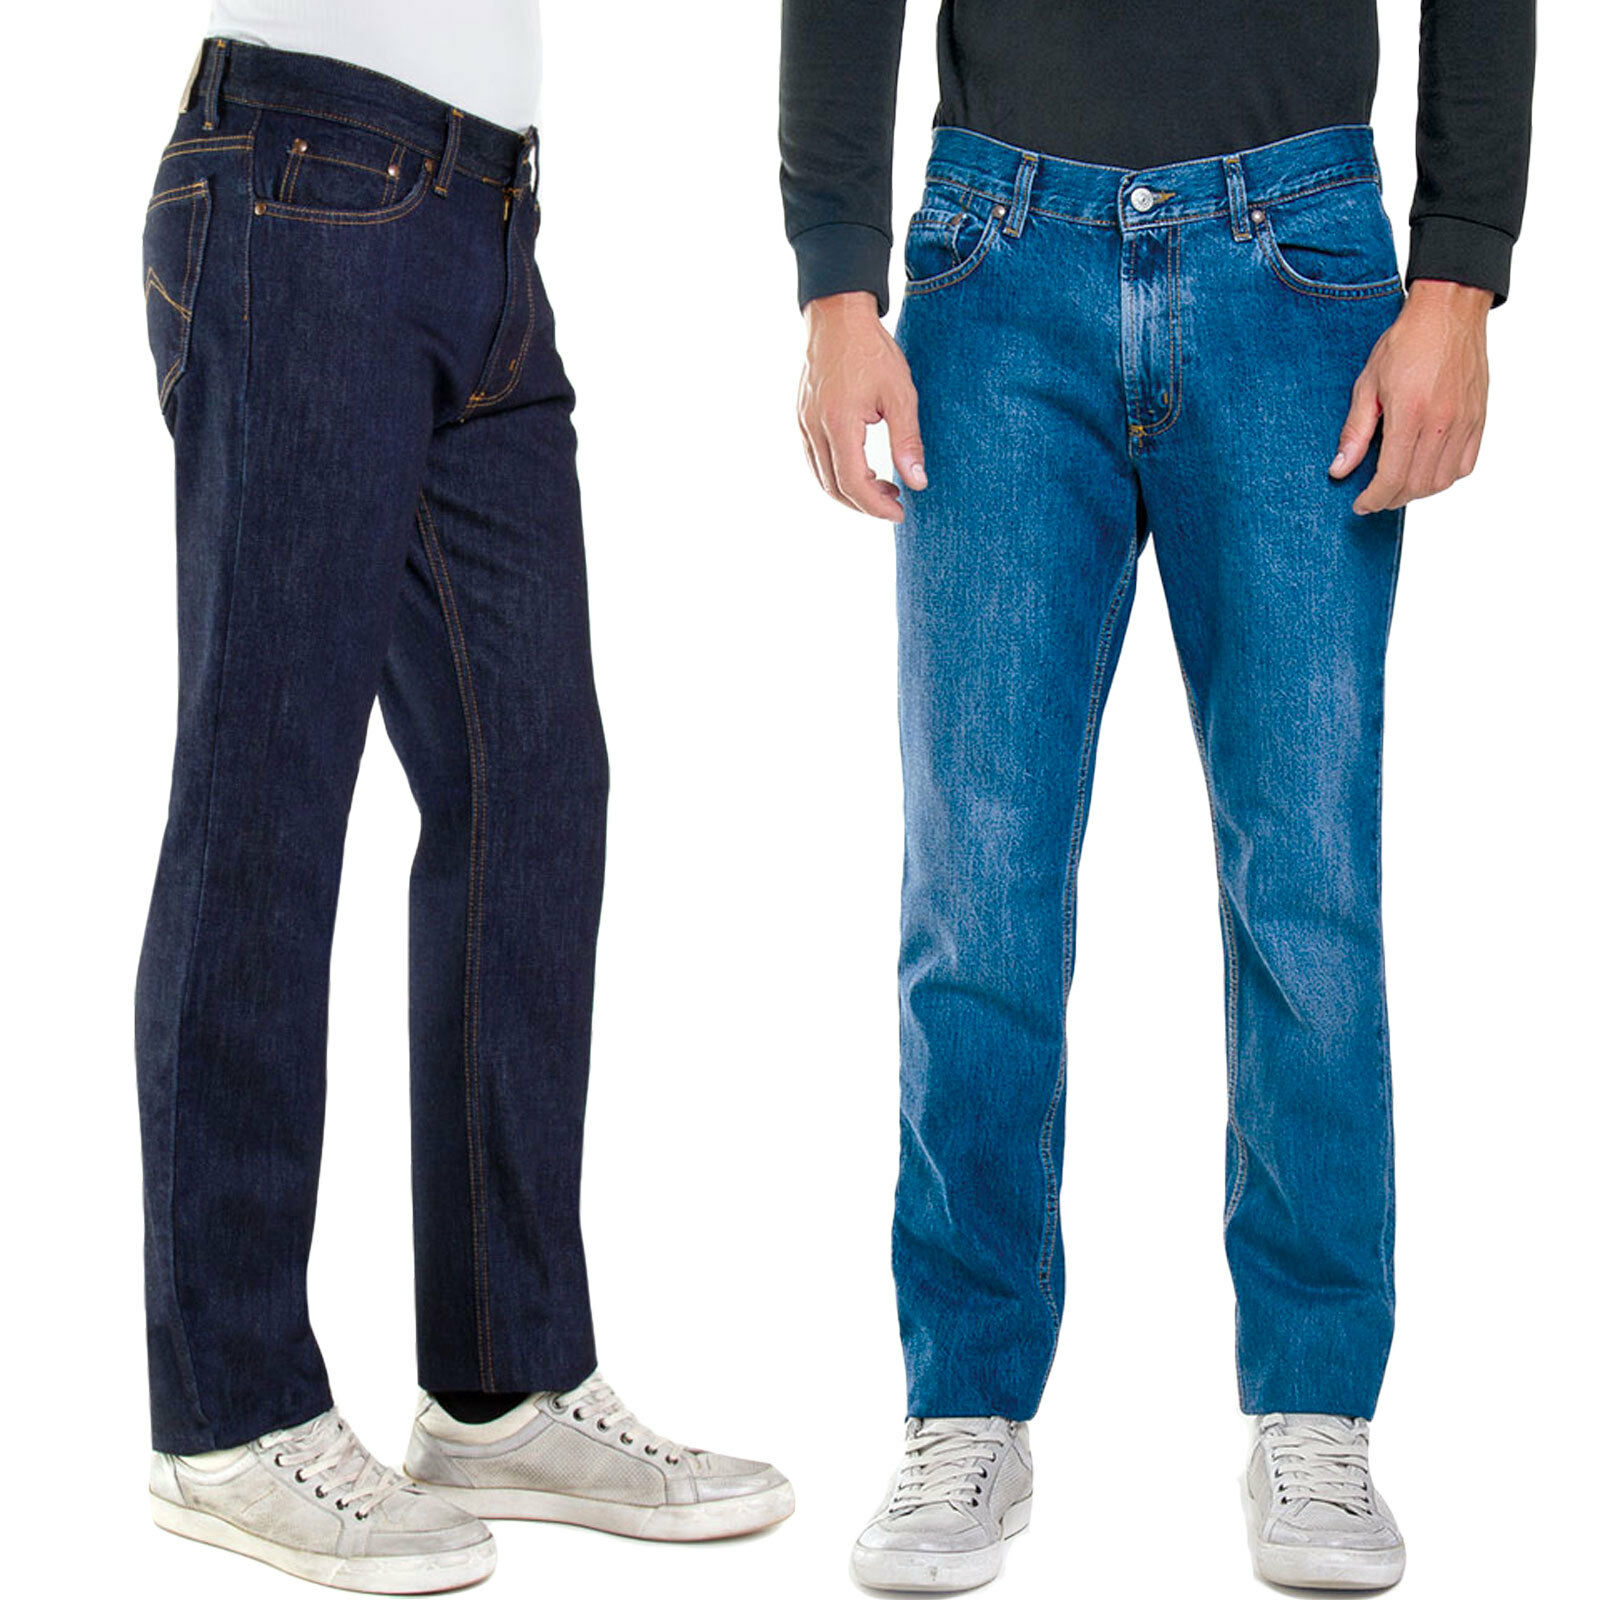 Dettagli su Carrera Jeans uomo pantaloni vita regolare 4 stagioni denim regular fit 700 1021